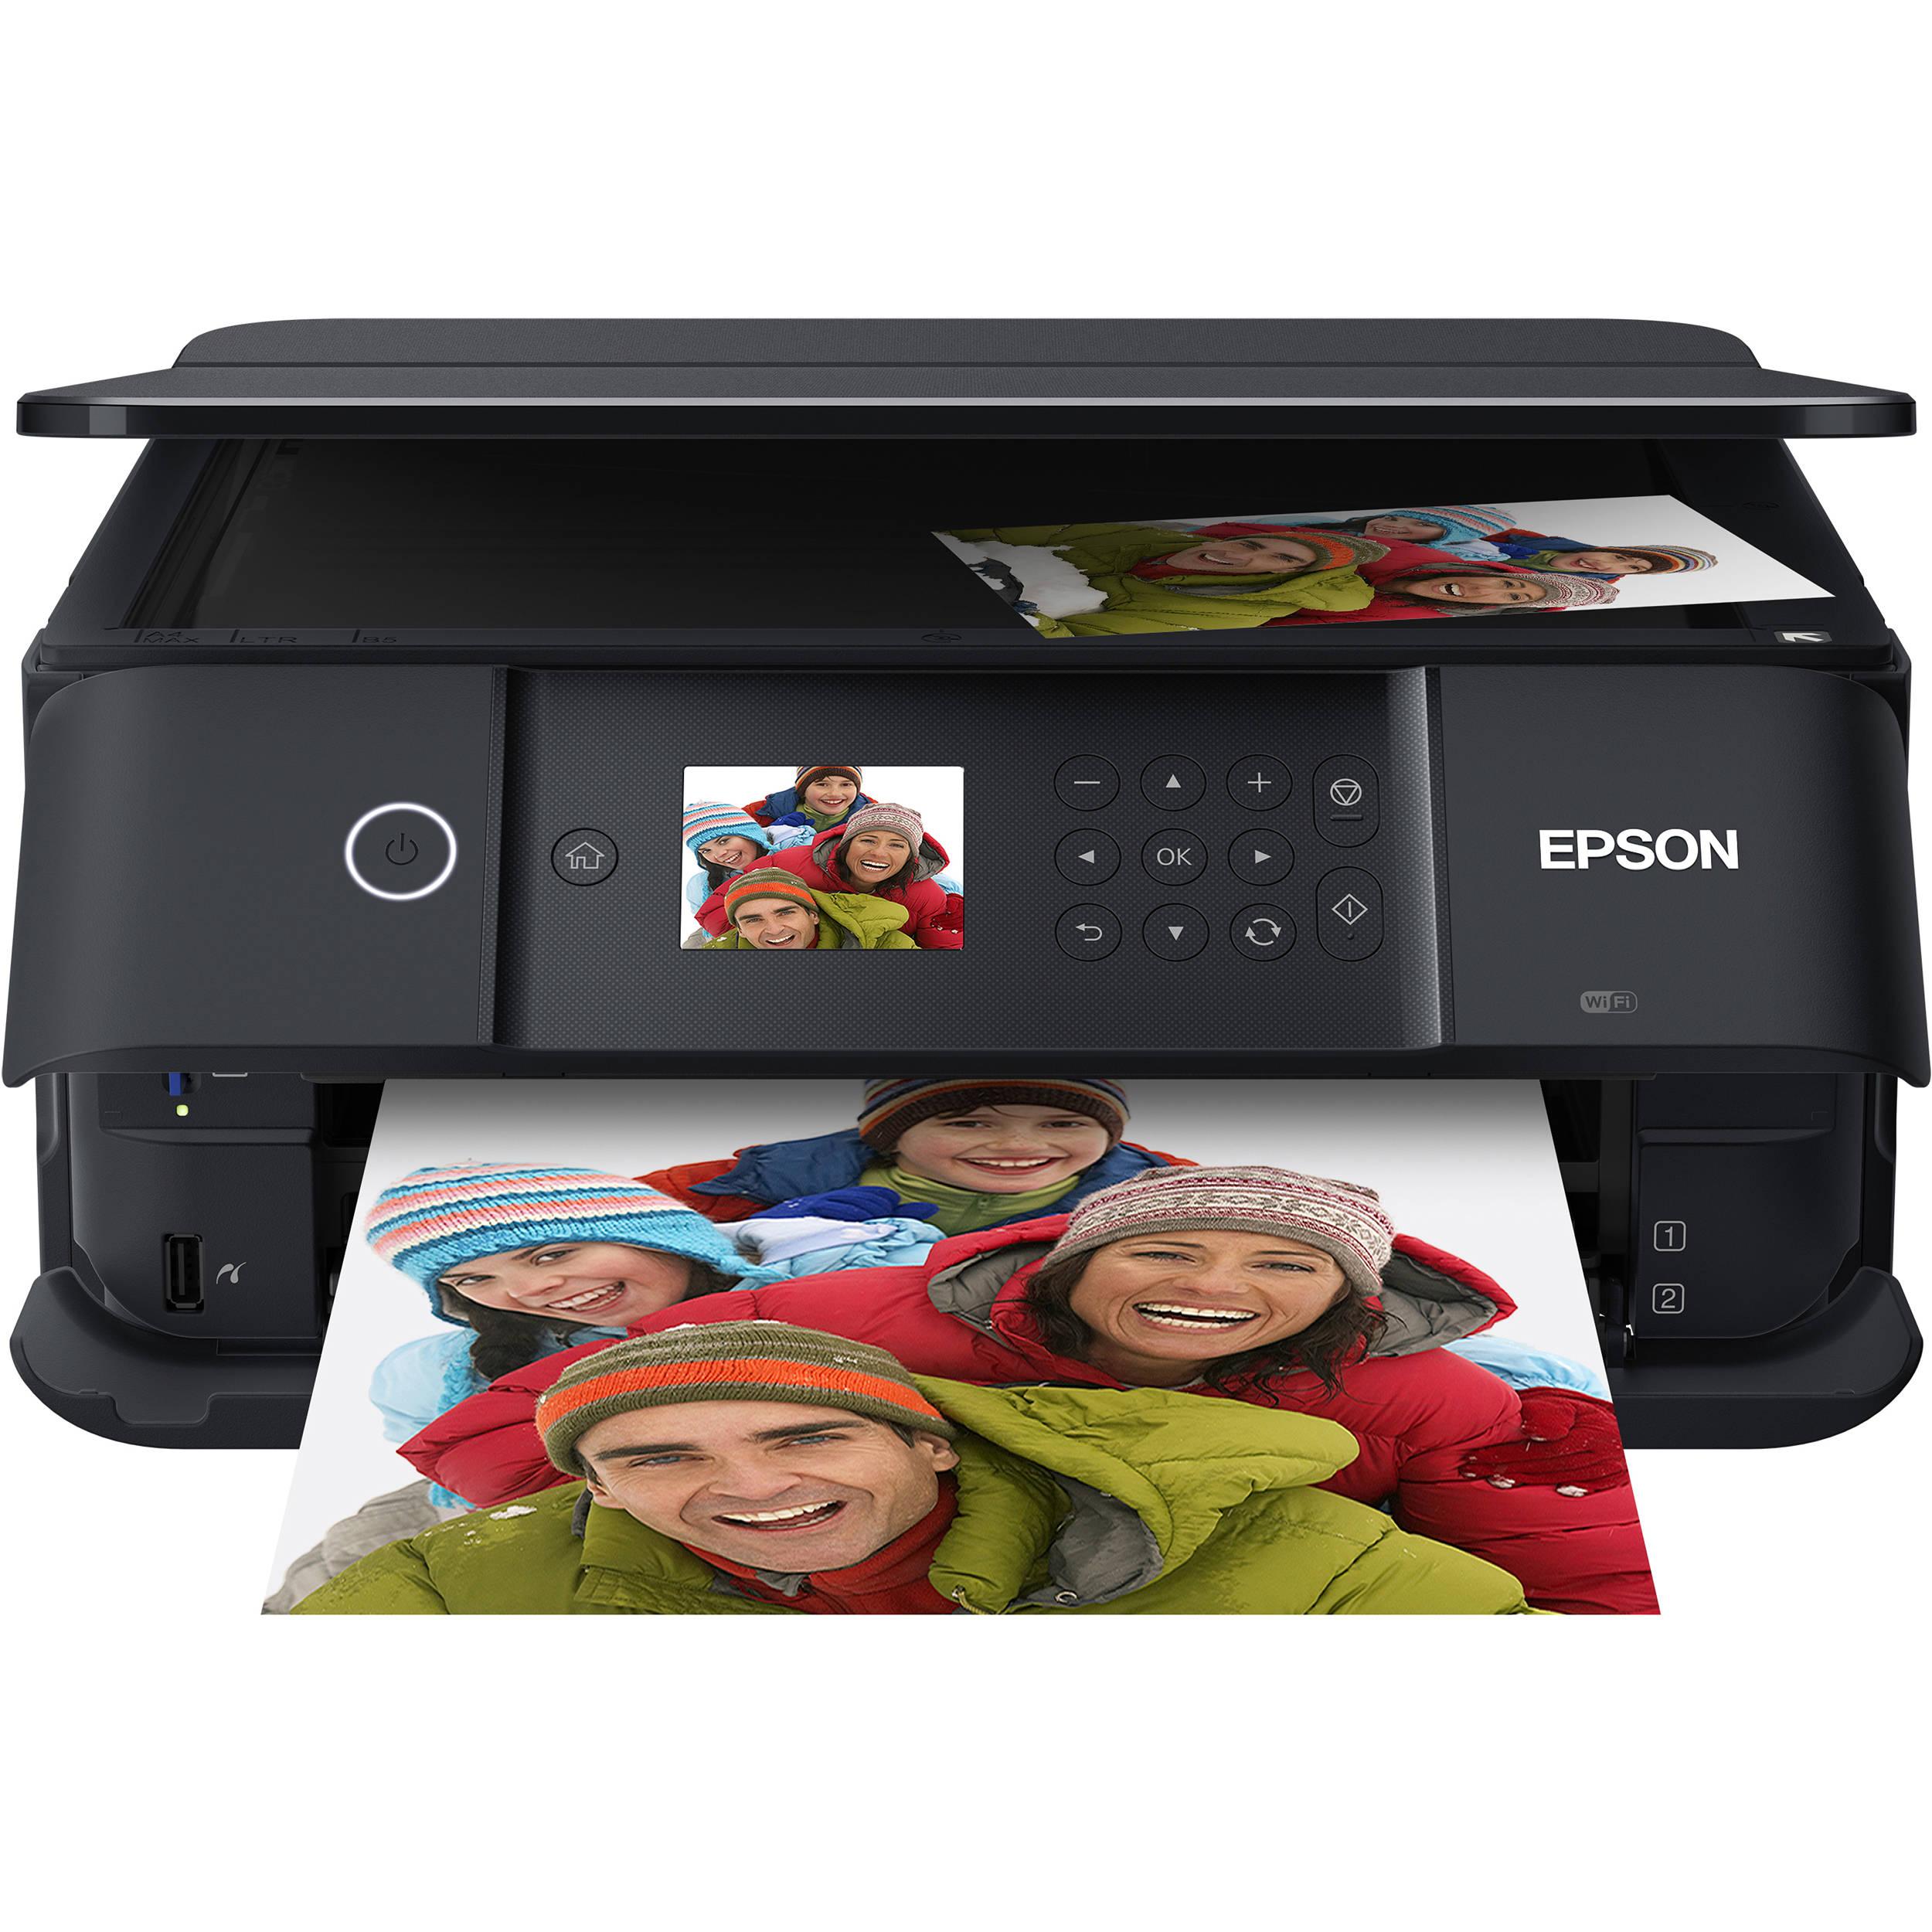 Epson Expression Premium XP-6100 All-In-One Printer